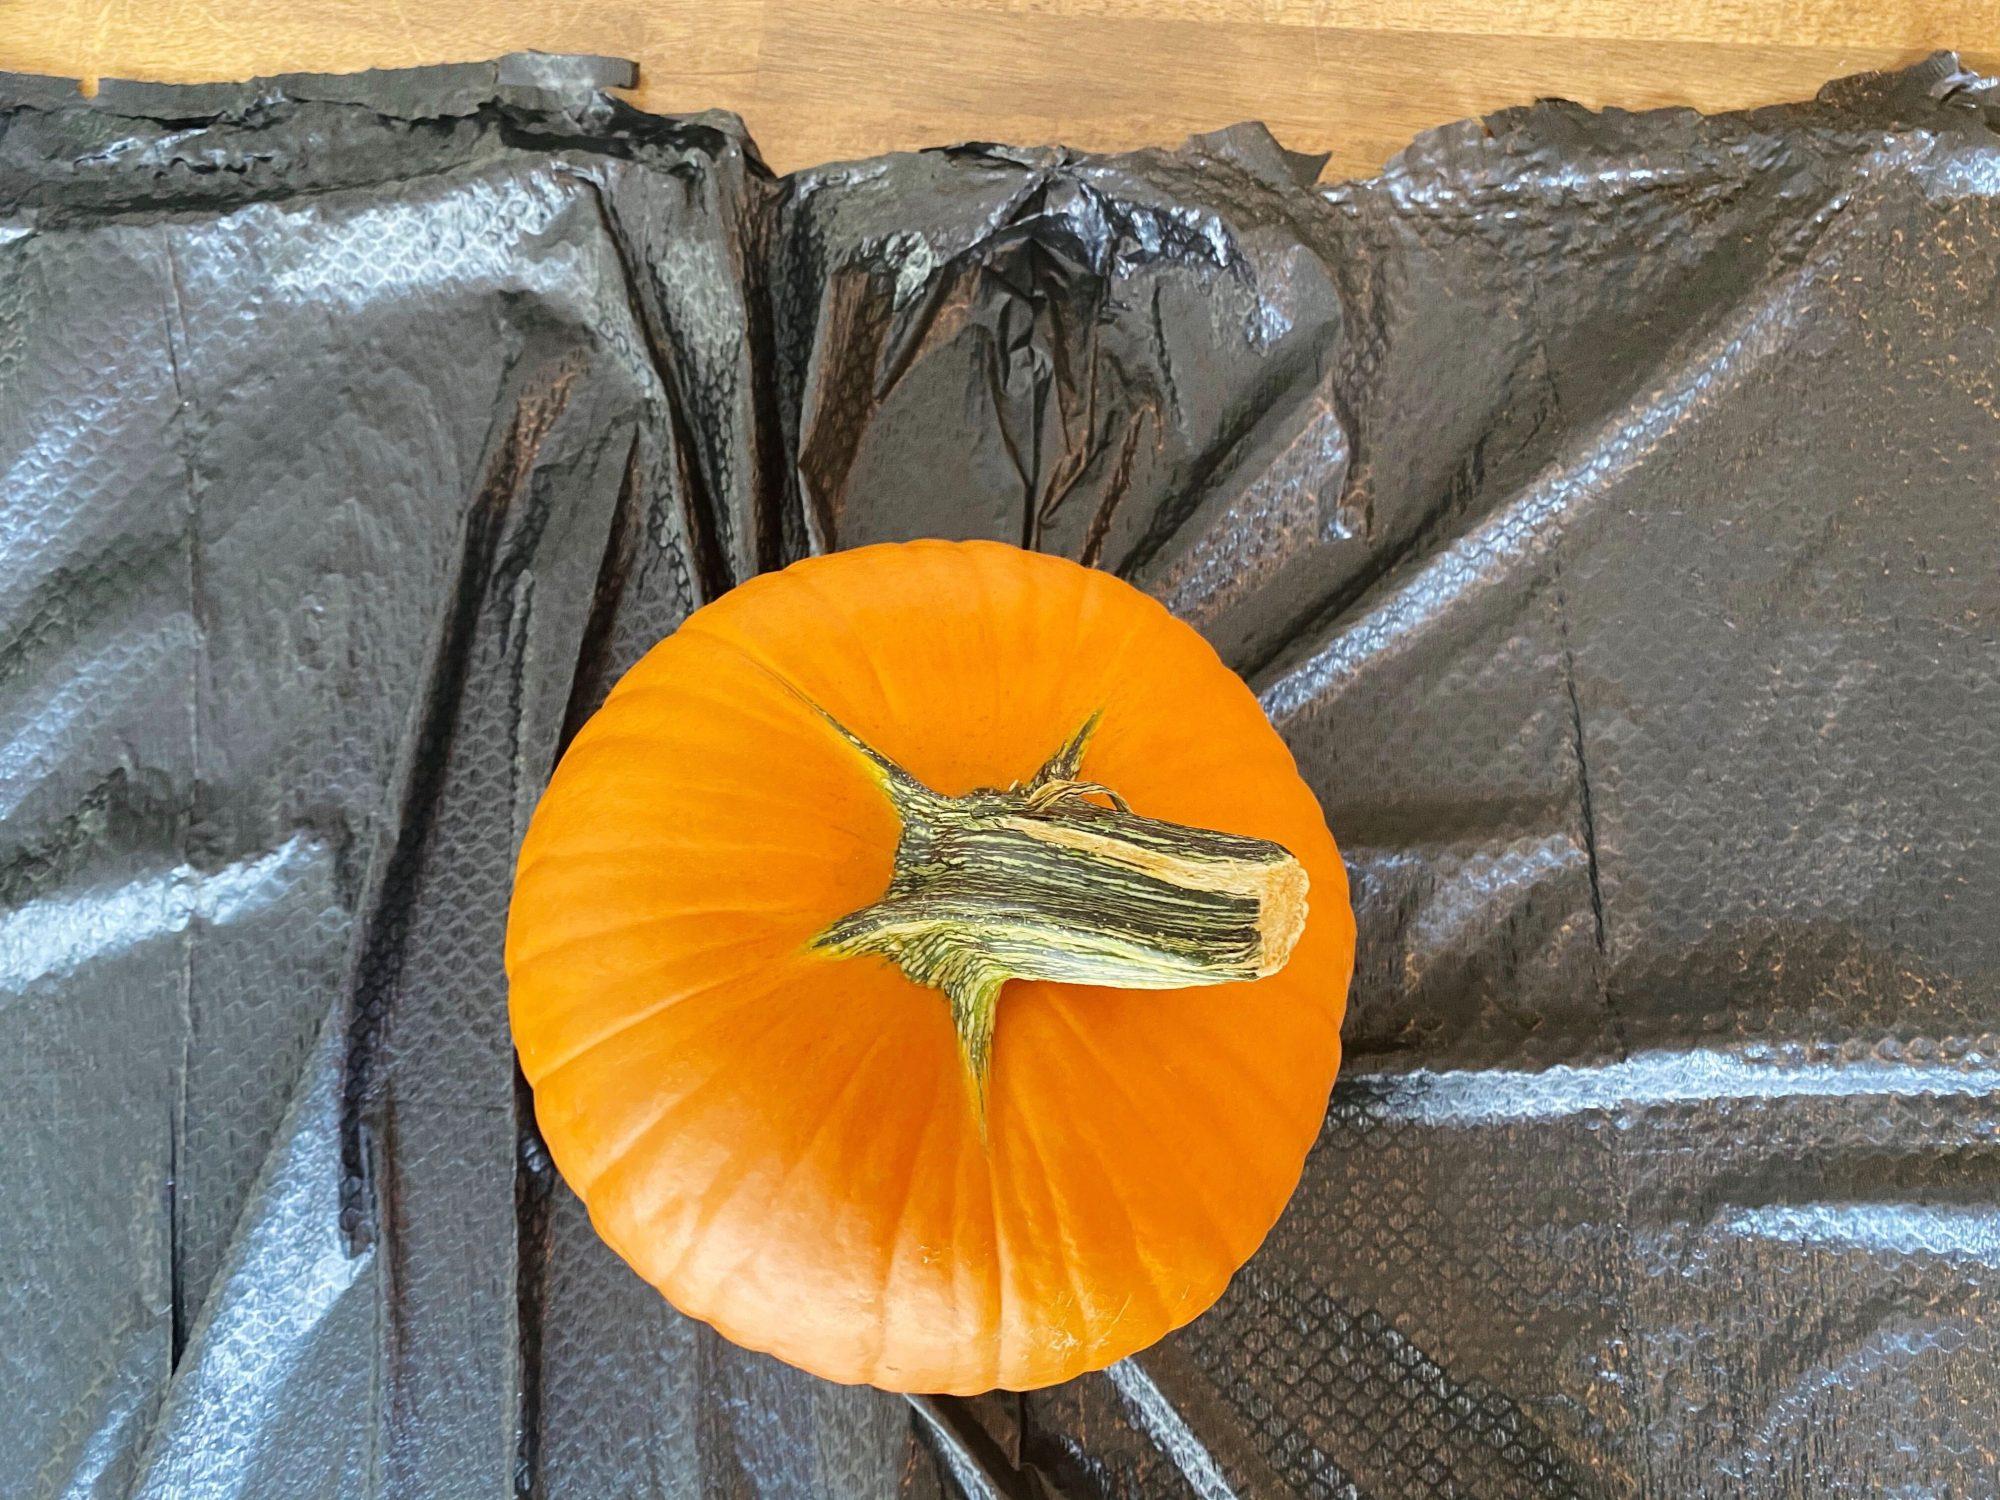 Whole pumpkin